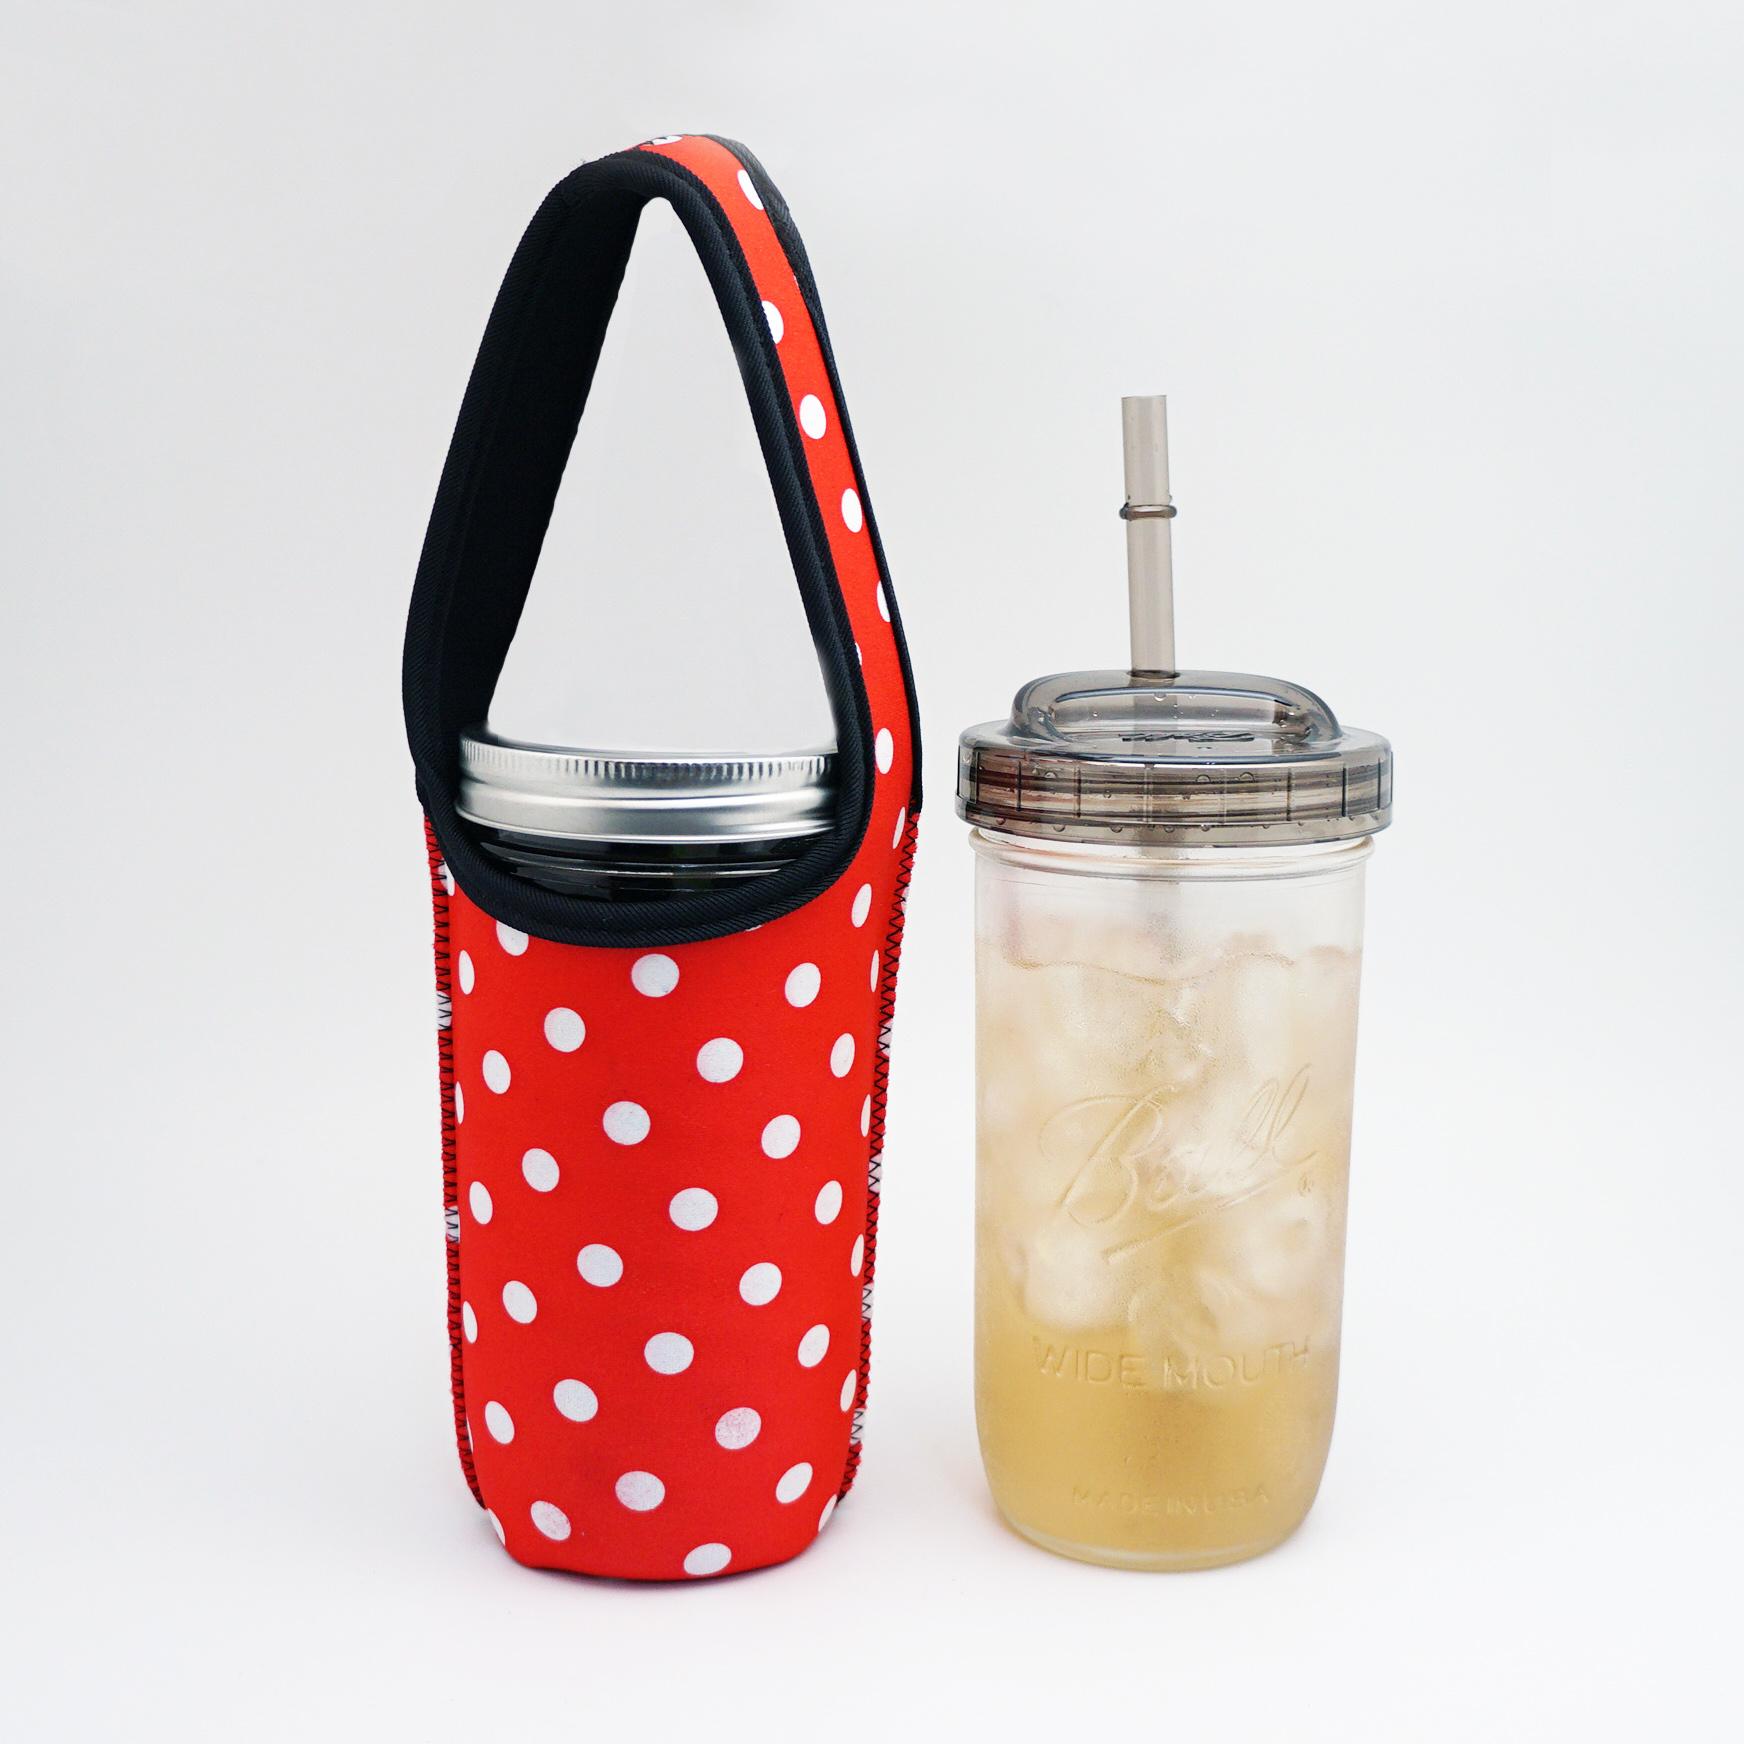 BLR 24oz梅森罐搖搖飲料杯袋組 紅底白點